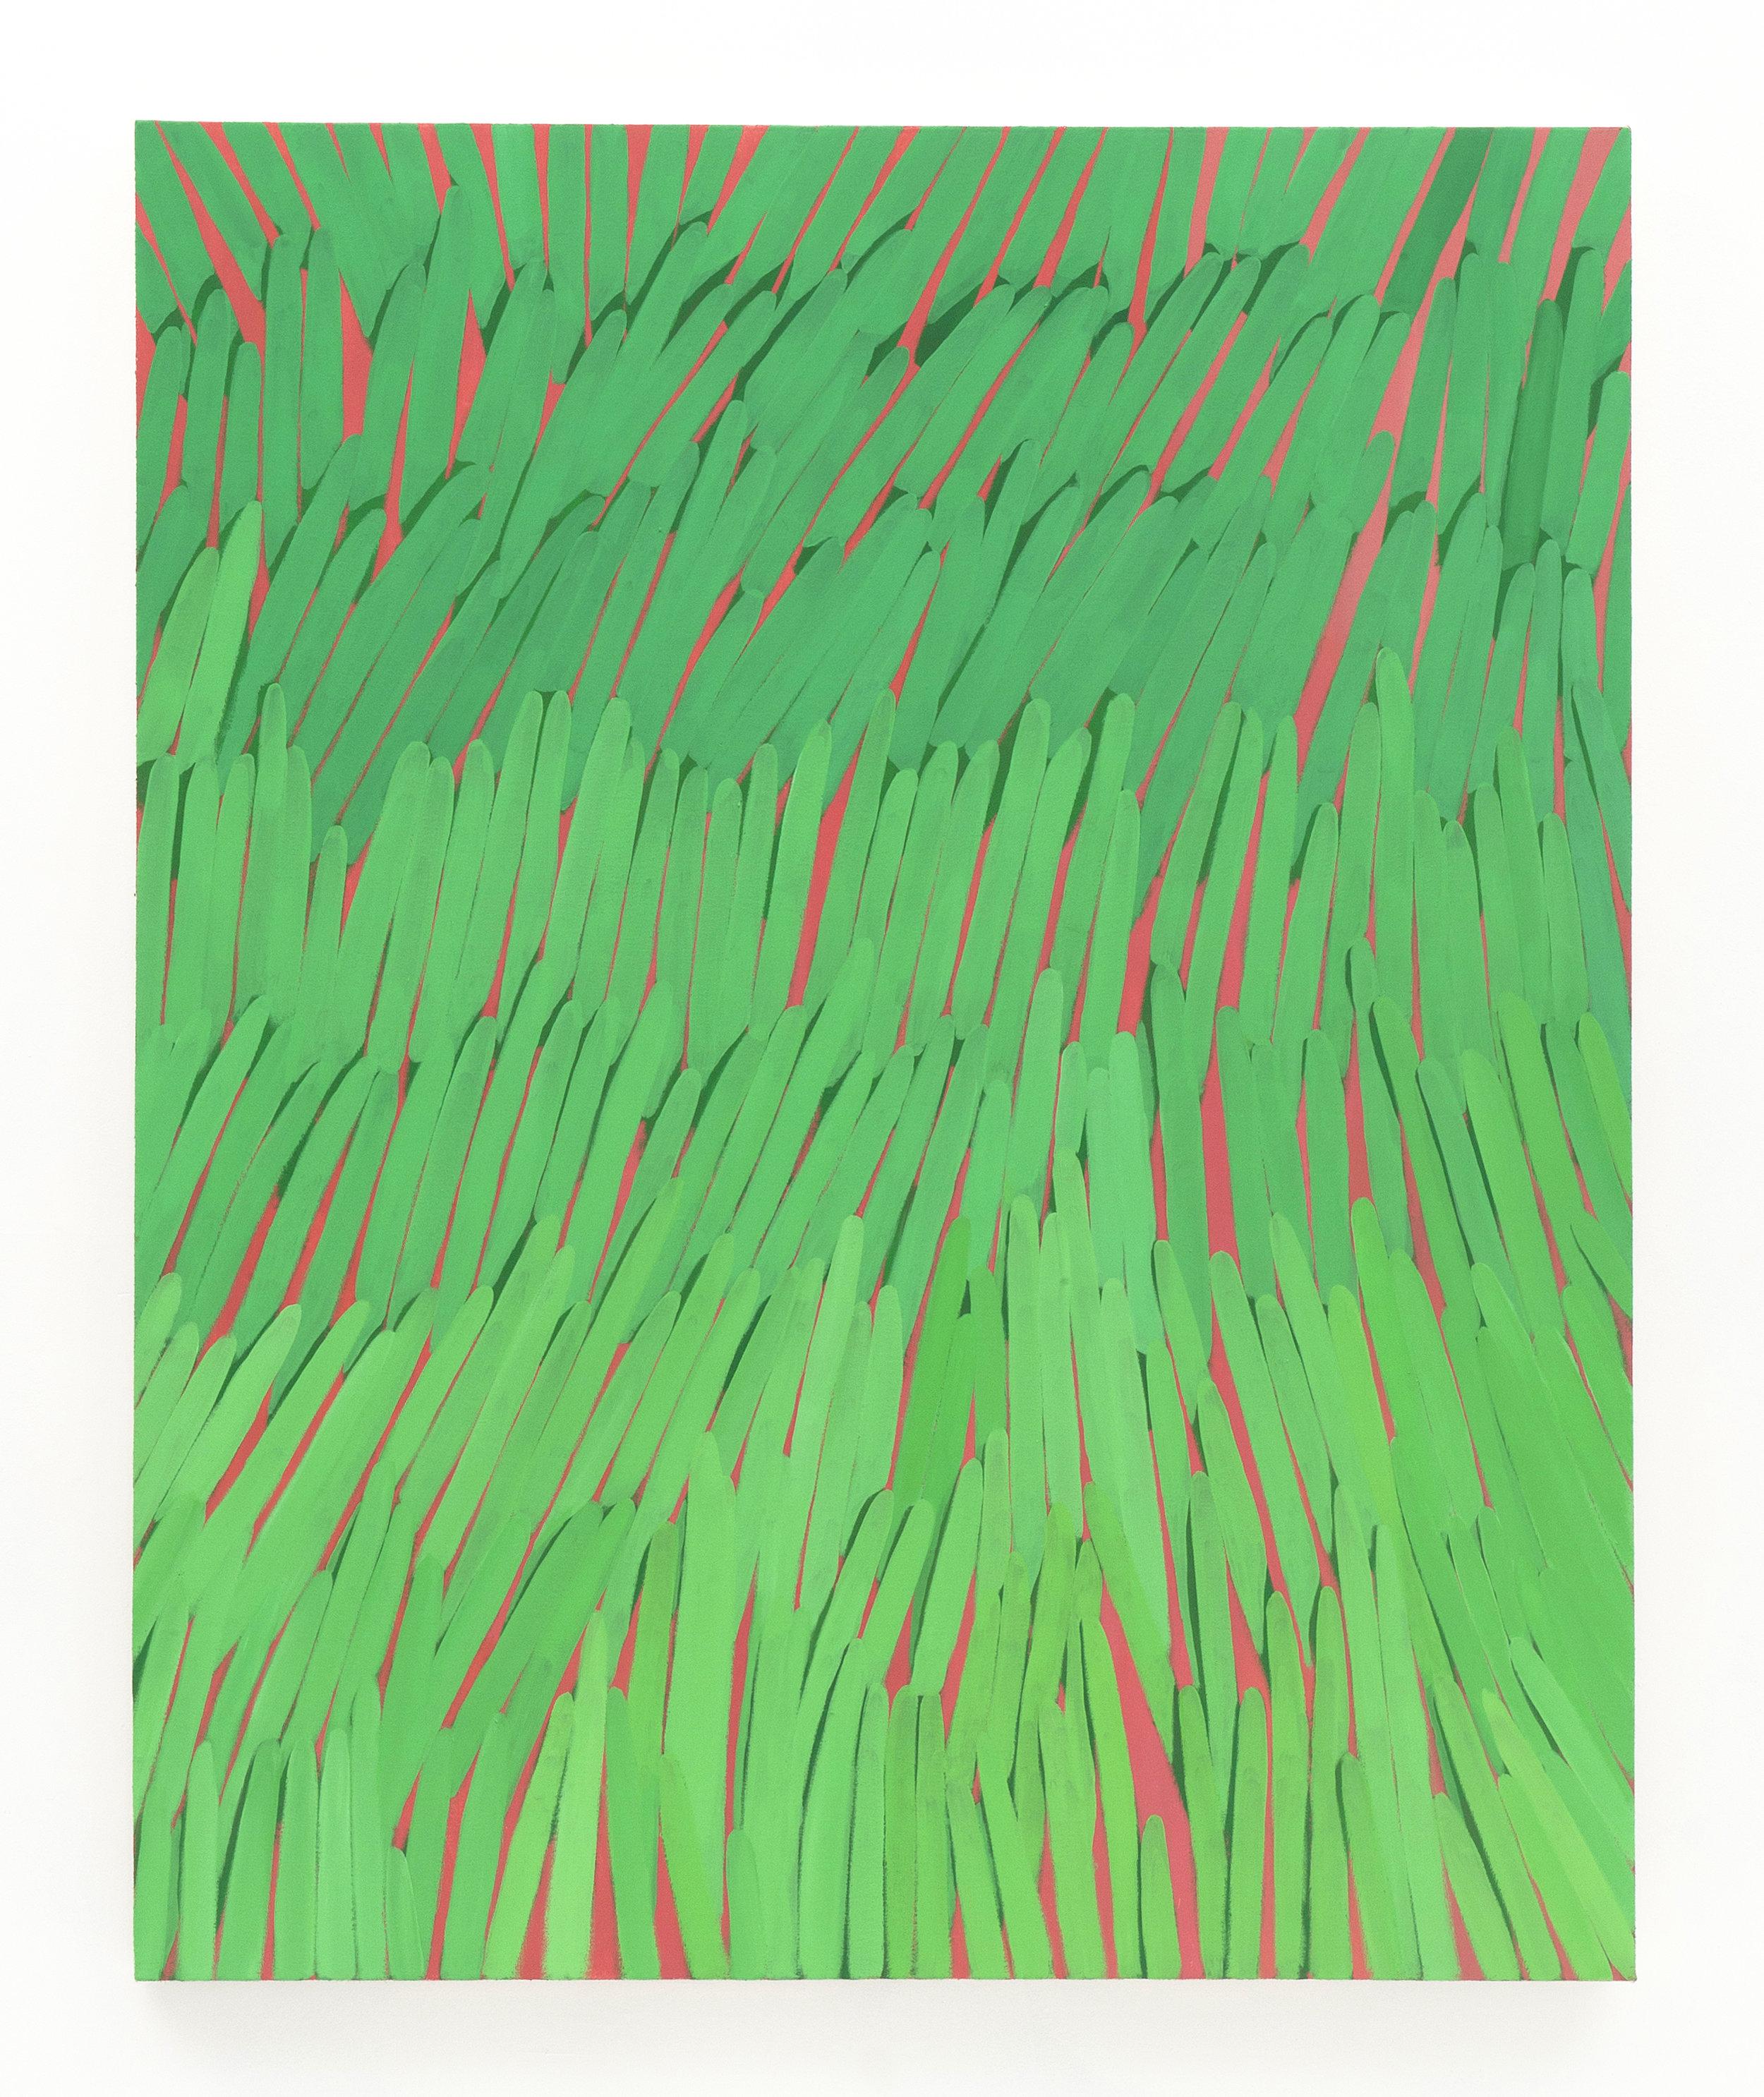 "Corydon Cowansage  Grass #43, 2015 acrylic on canvas, 50 x 40"""